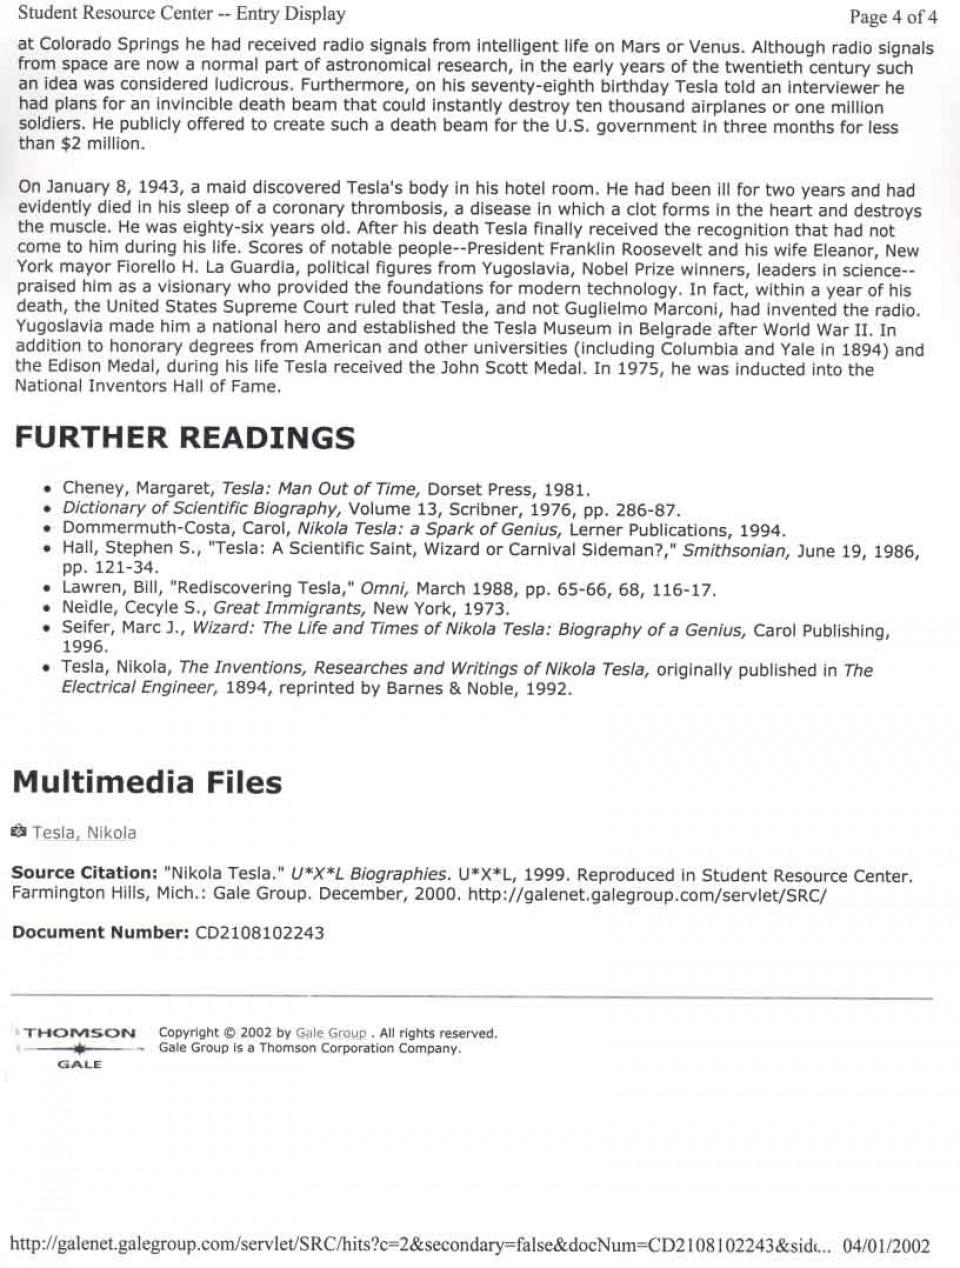 Resume writing service melbourne